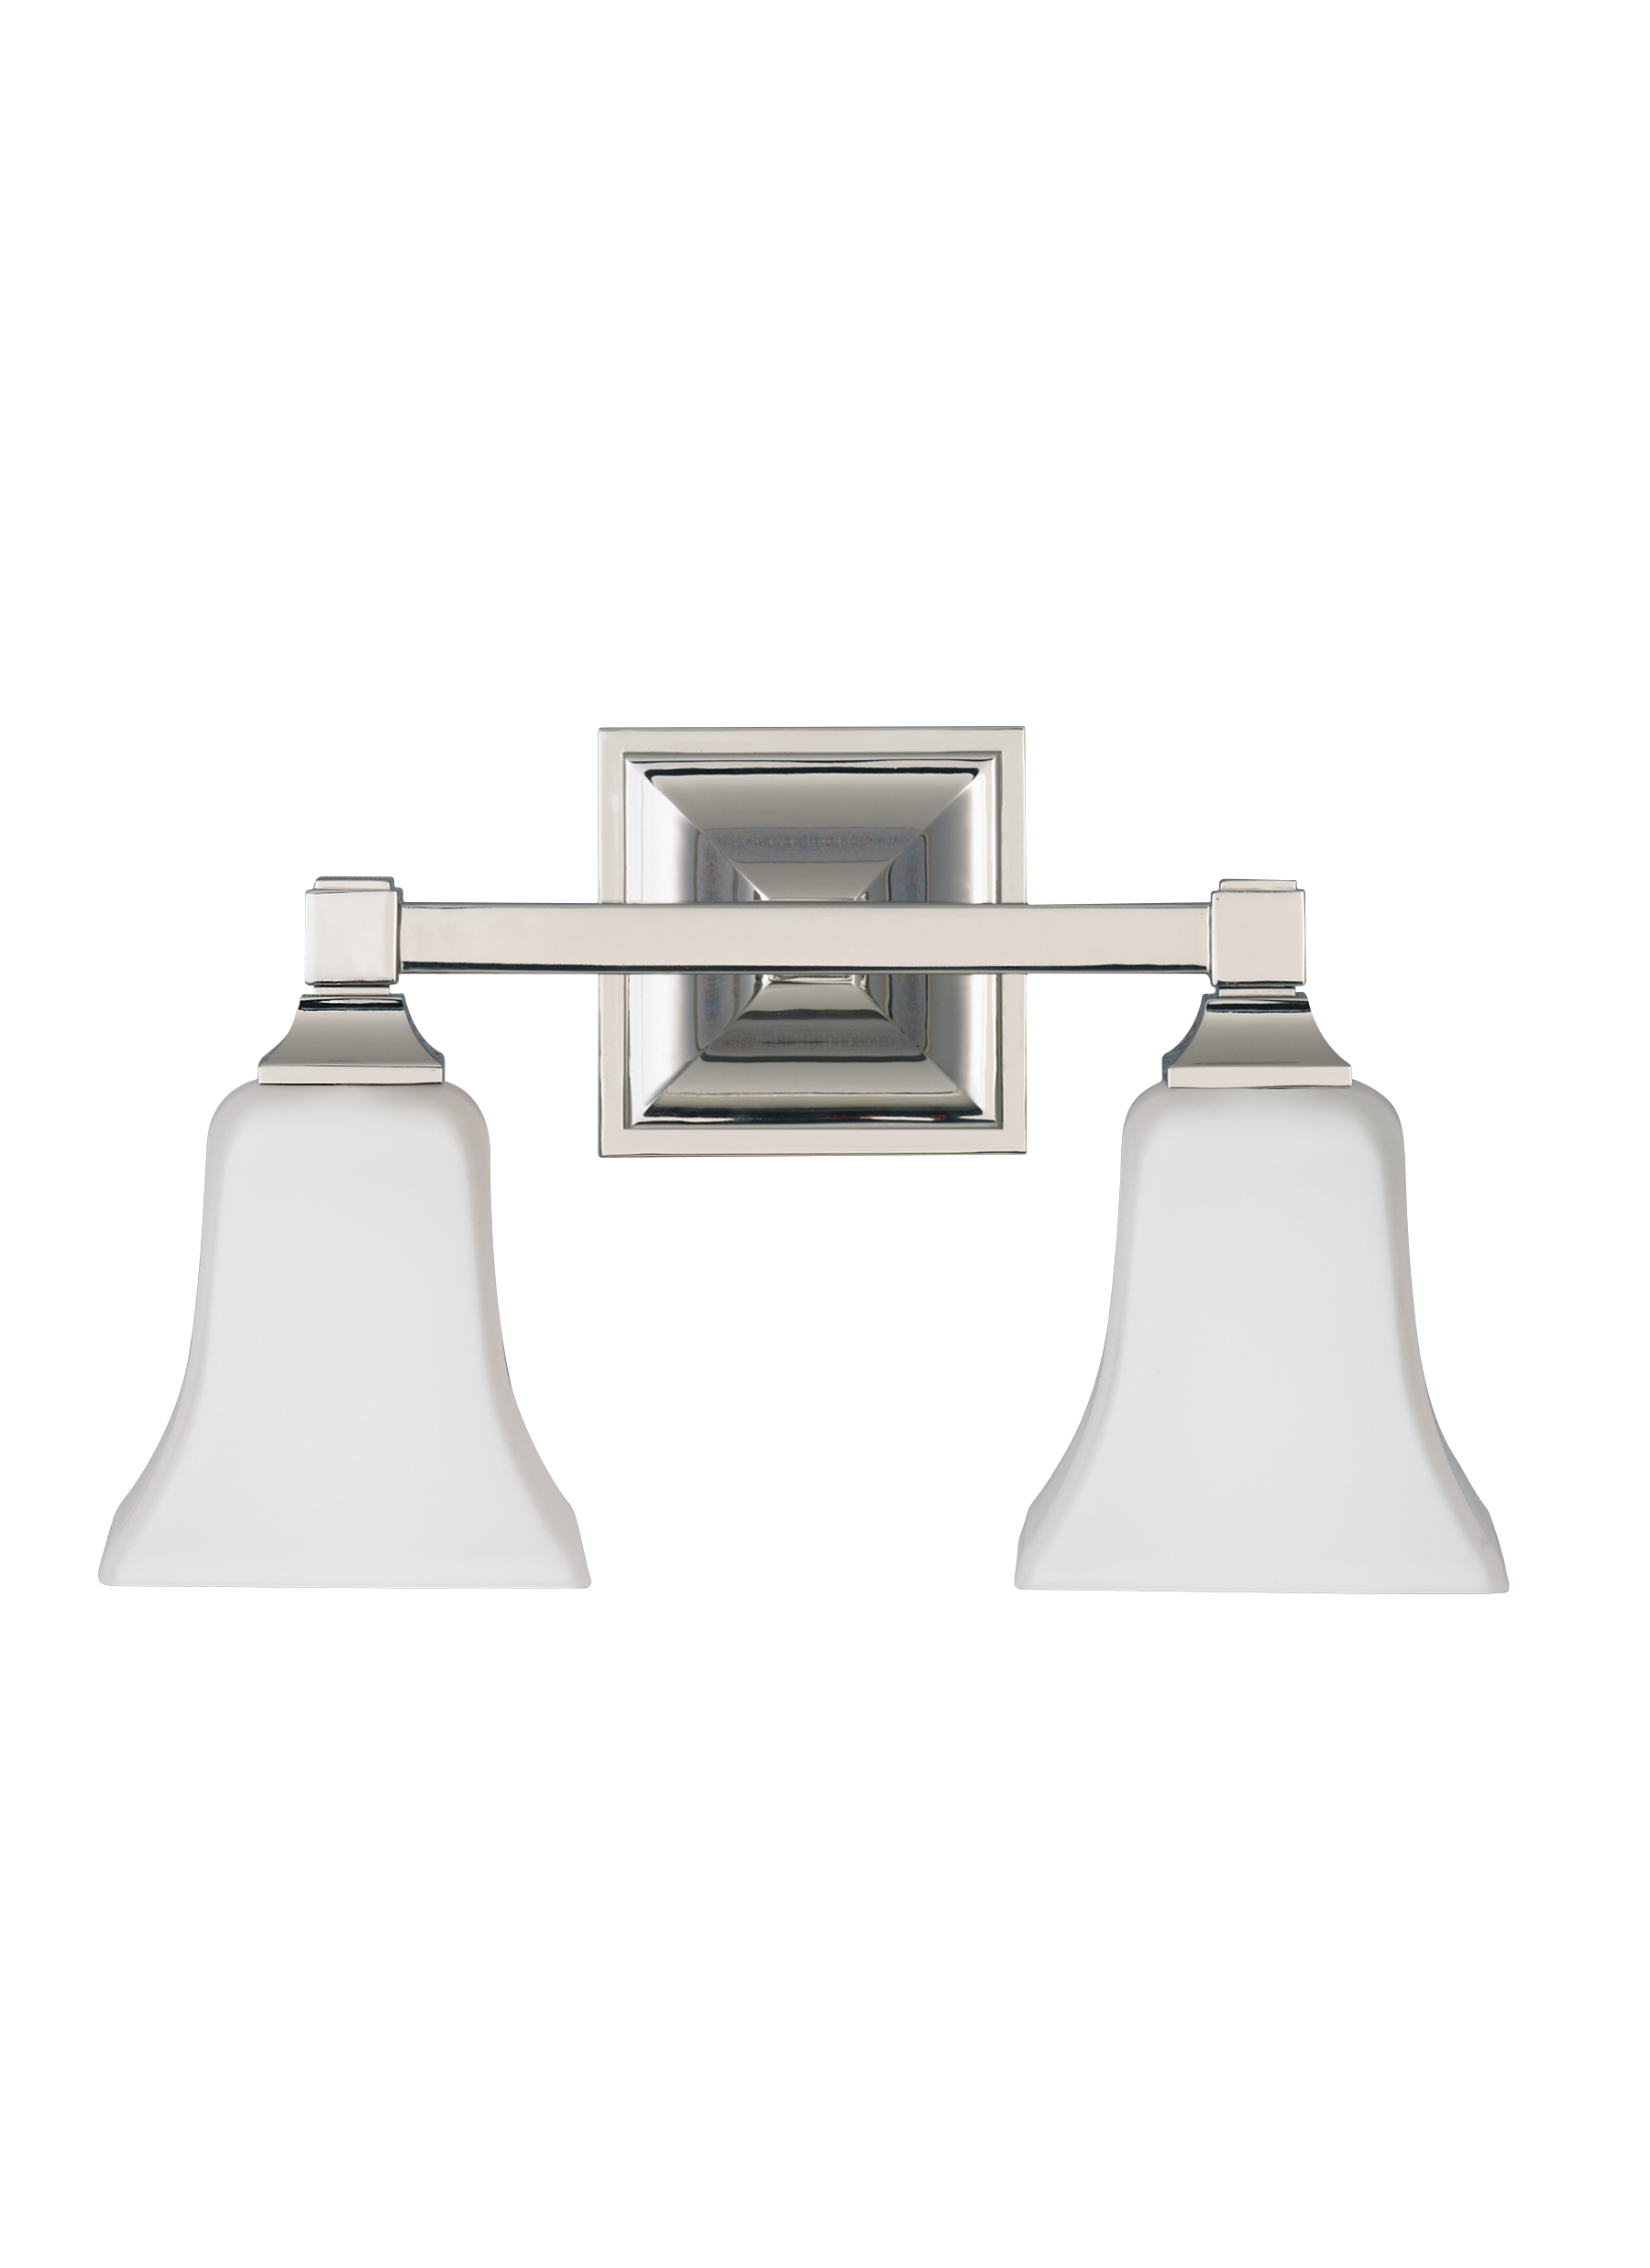 VS PN 2 Light Vanity Fixture Polished Nickel